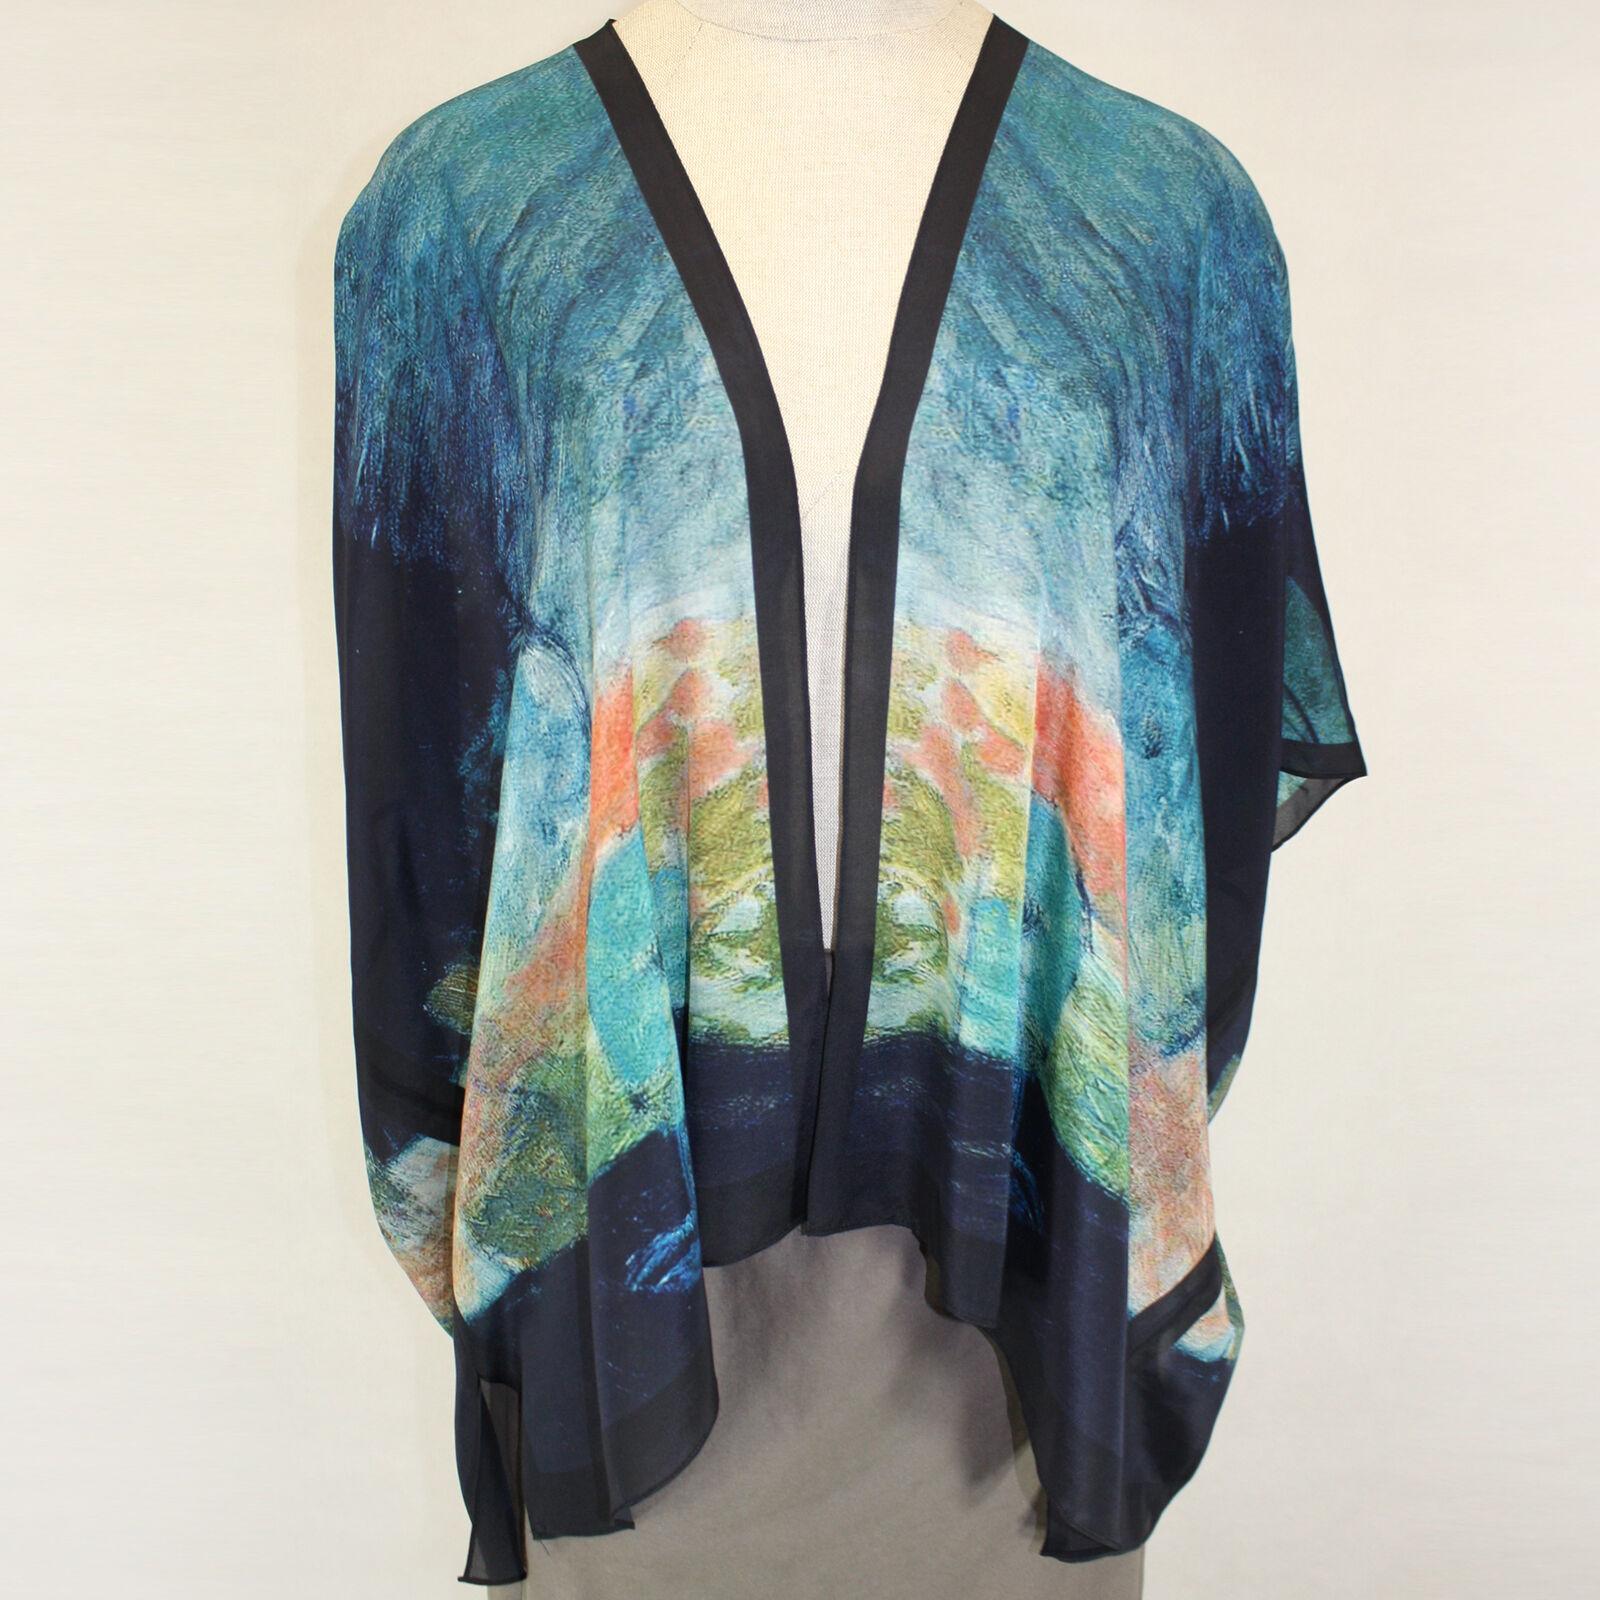 NEW NWT Cocoon House Aurora Art to Wear 100% Silk Kimono Blouse Large XL (1X 2X)